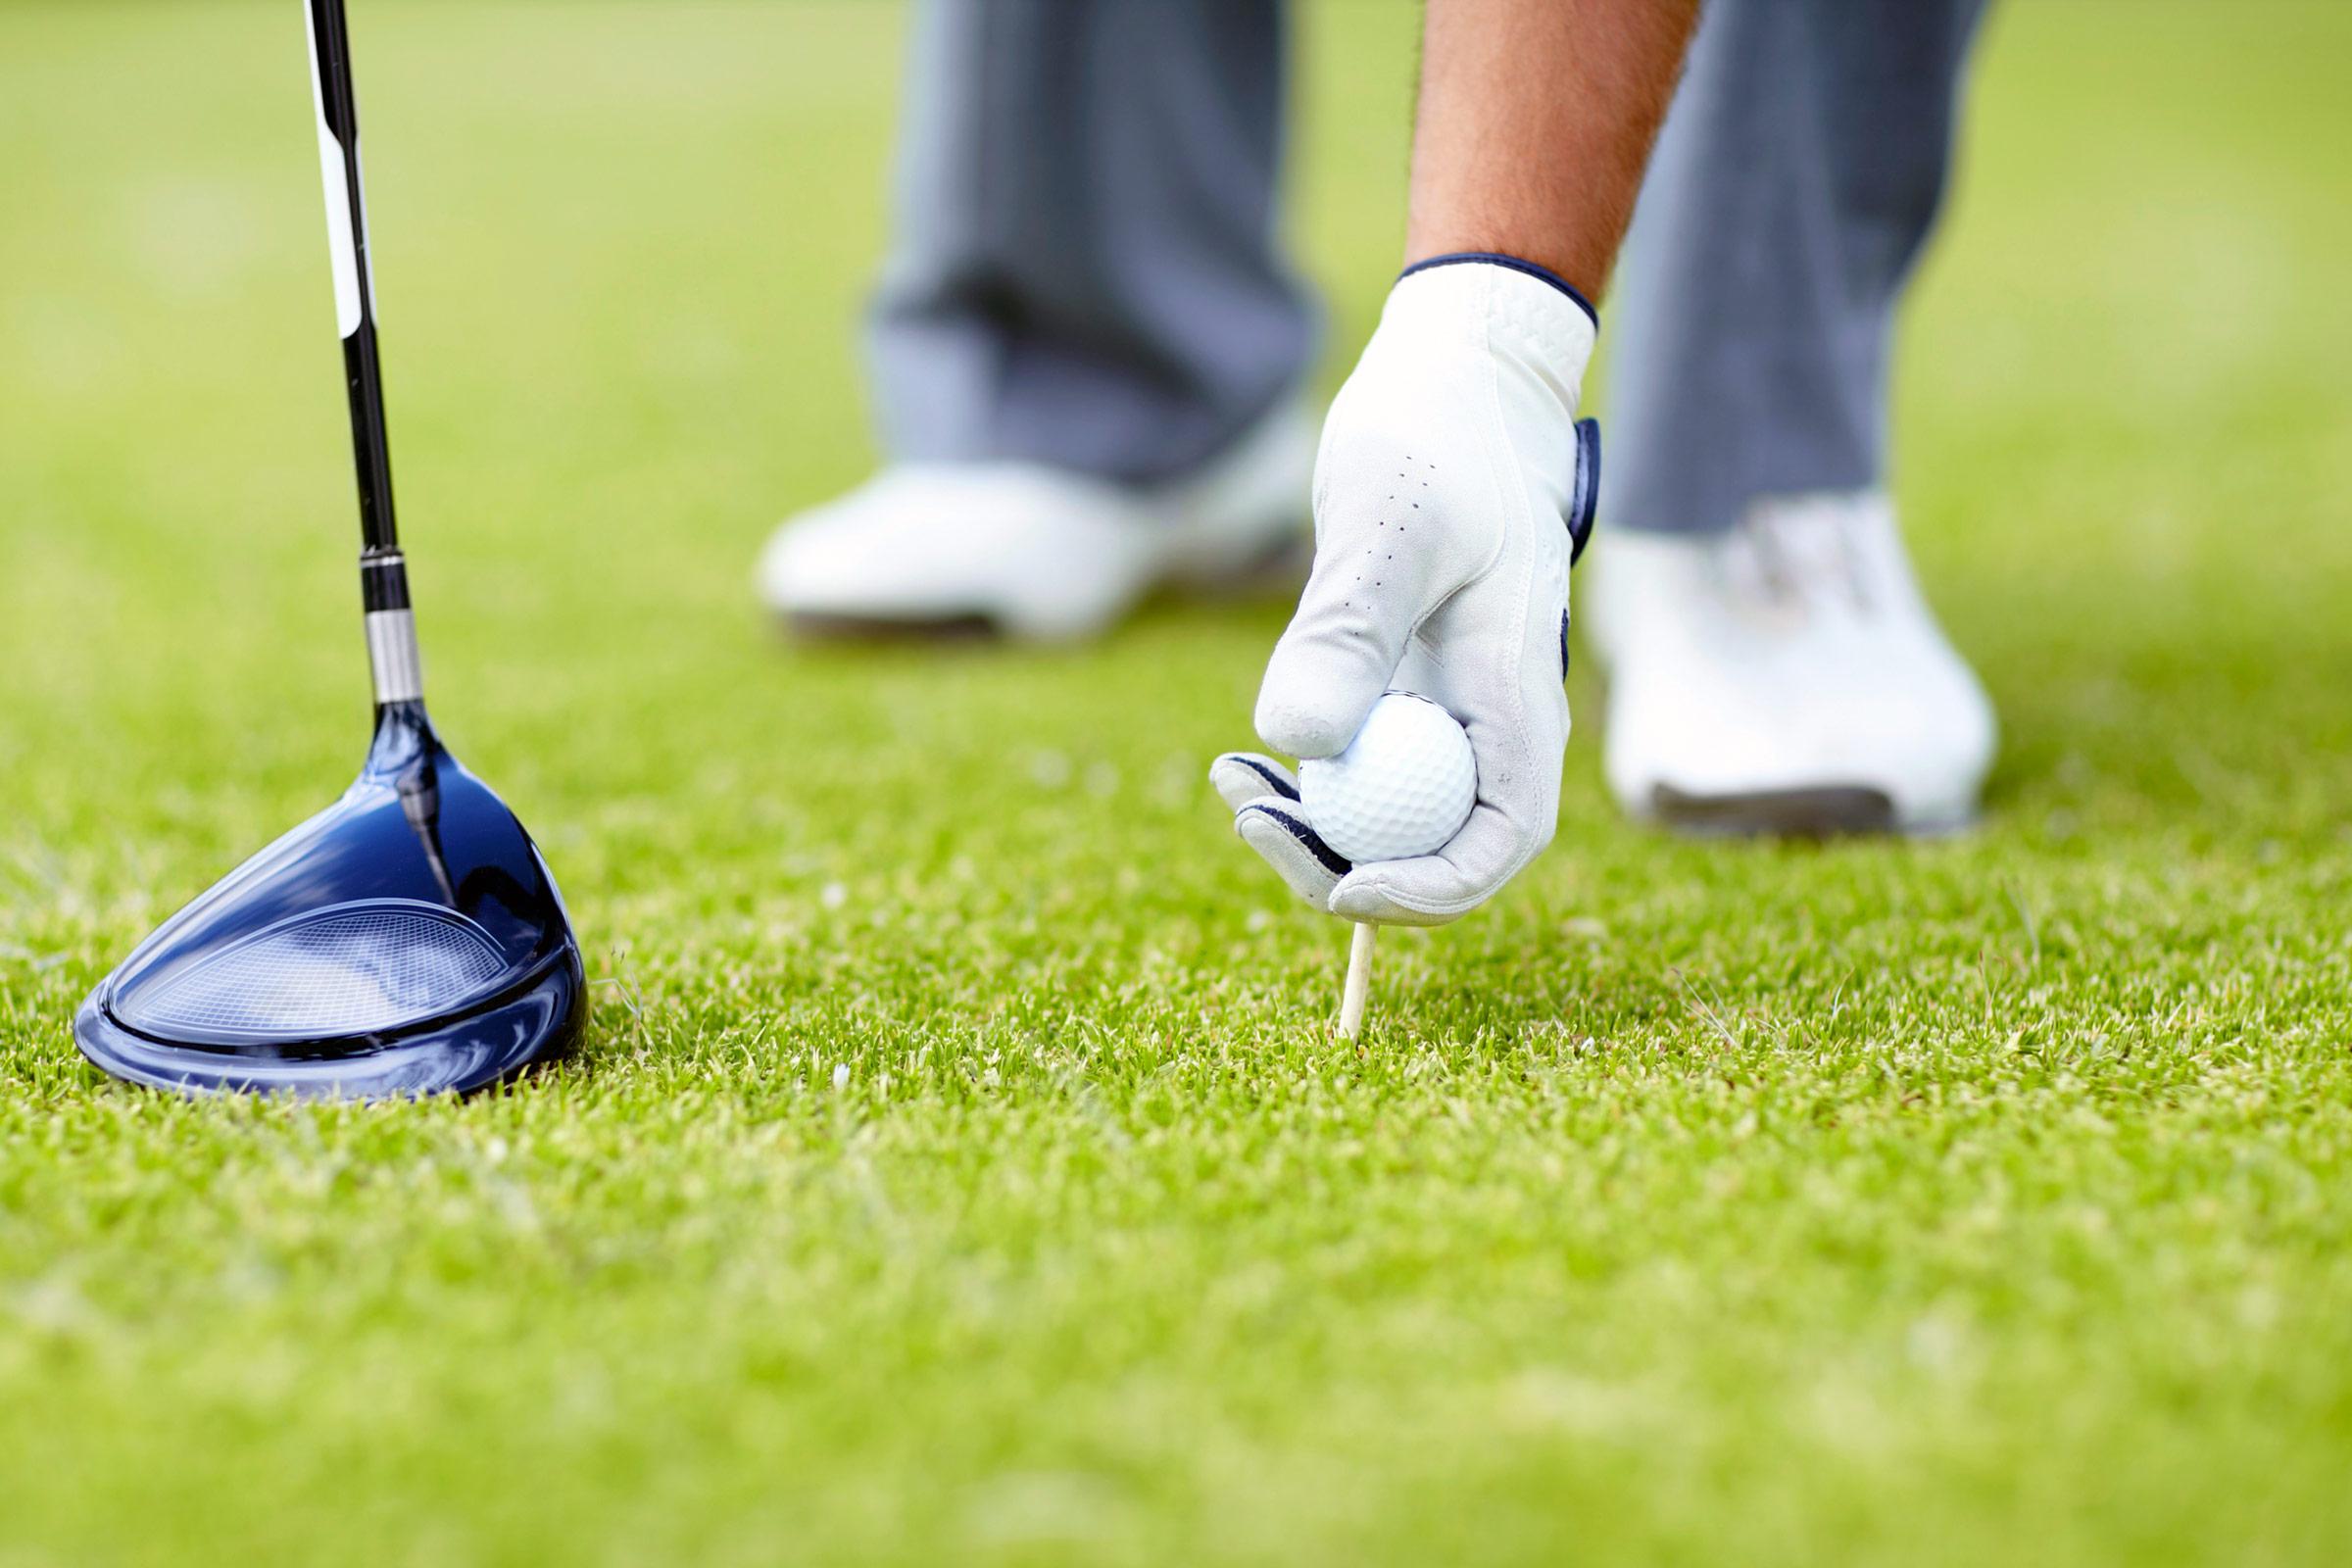 1, Play golf